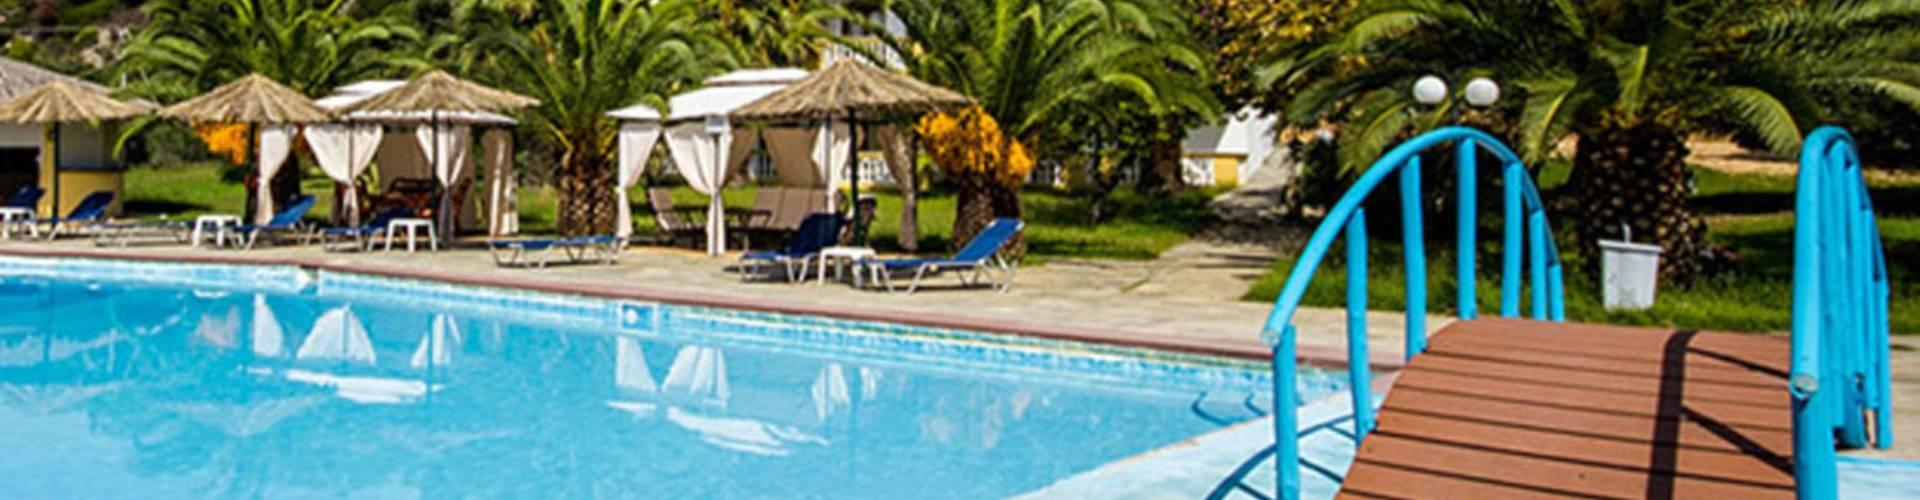 Koviou Holiday Village hotel